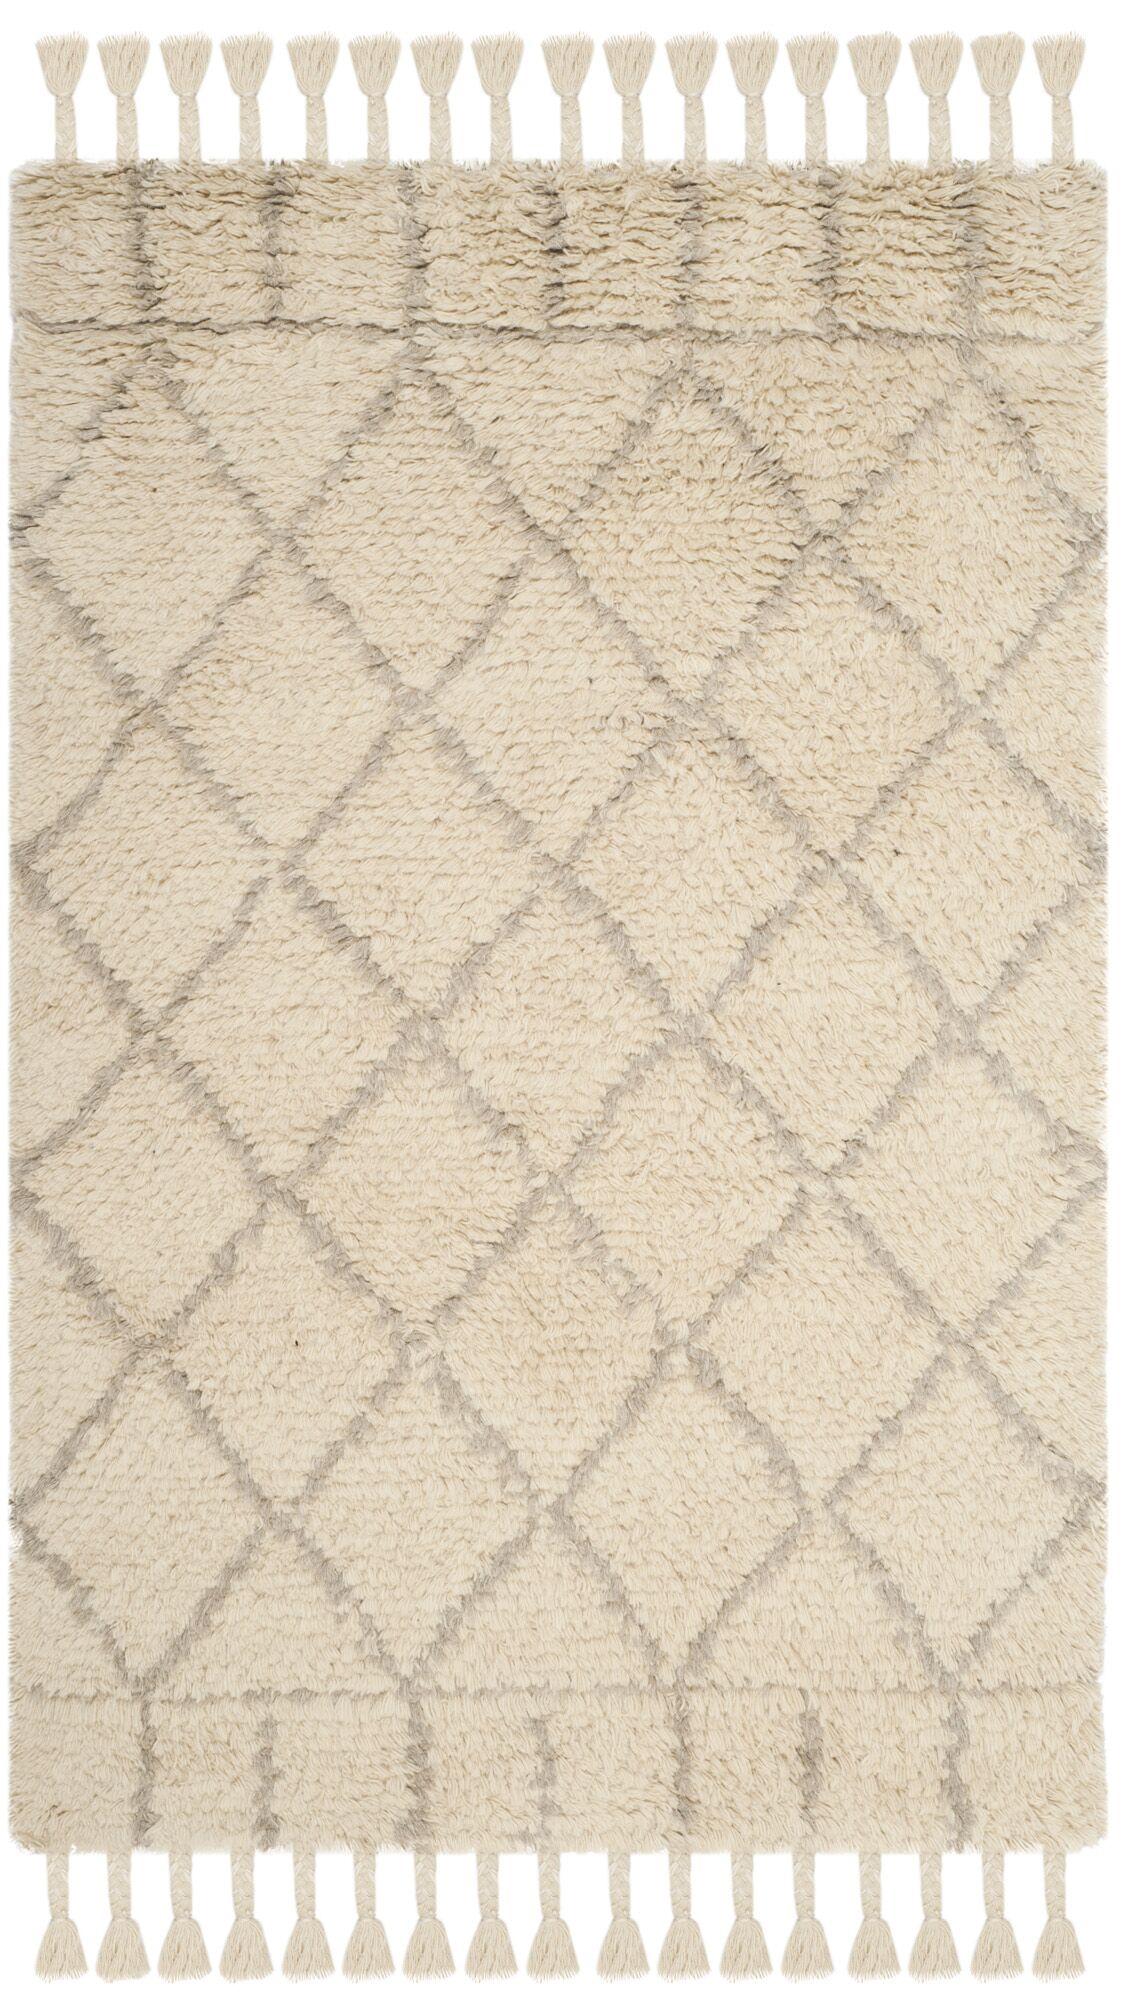 Livingston Hand-Tufted Beige Area Rug Rug Size: Rectangle 4' x 6'